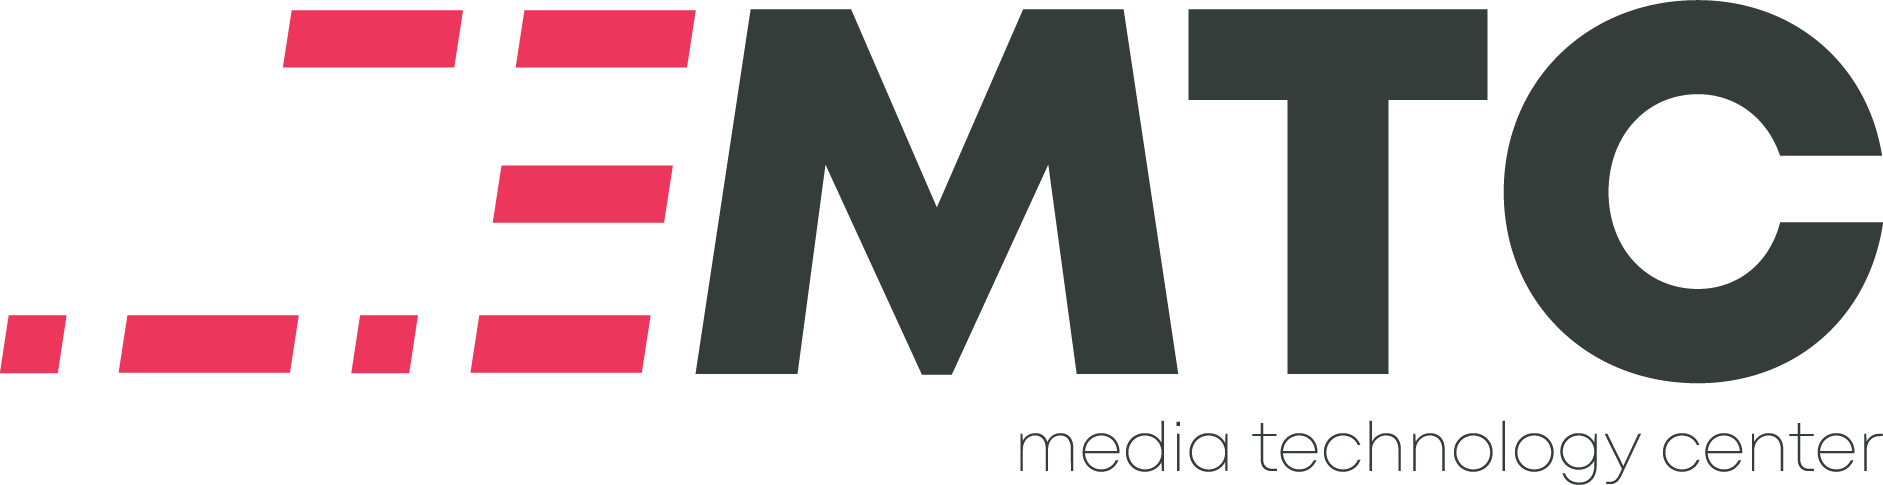 ETH Zürich Media Technology Center